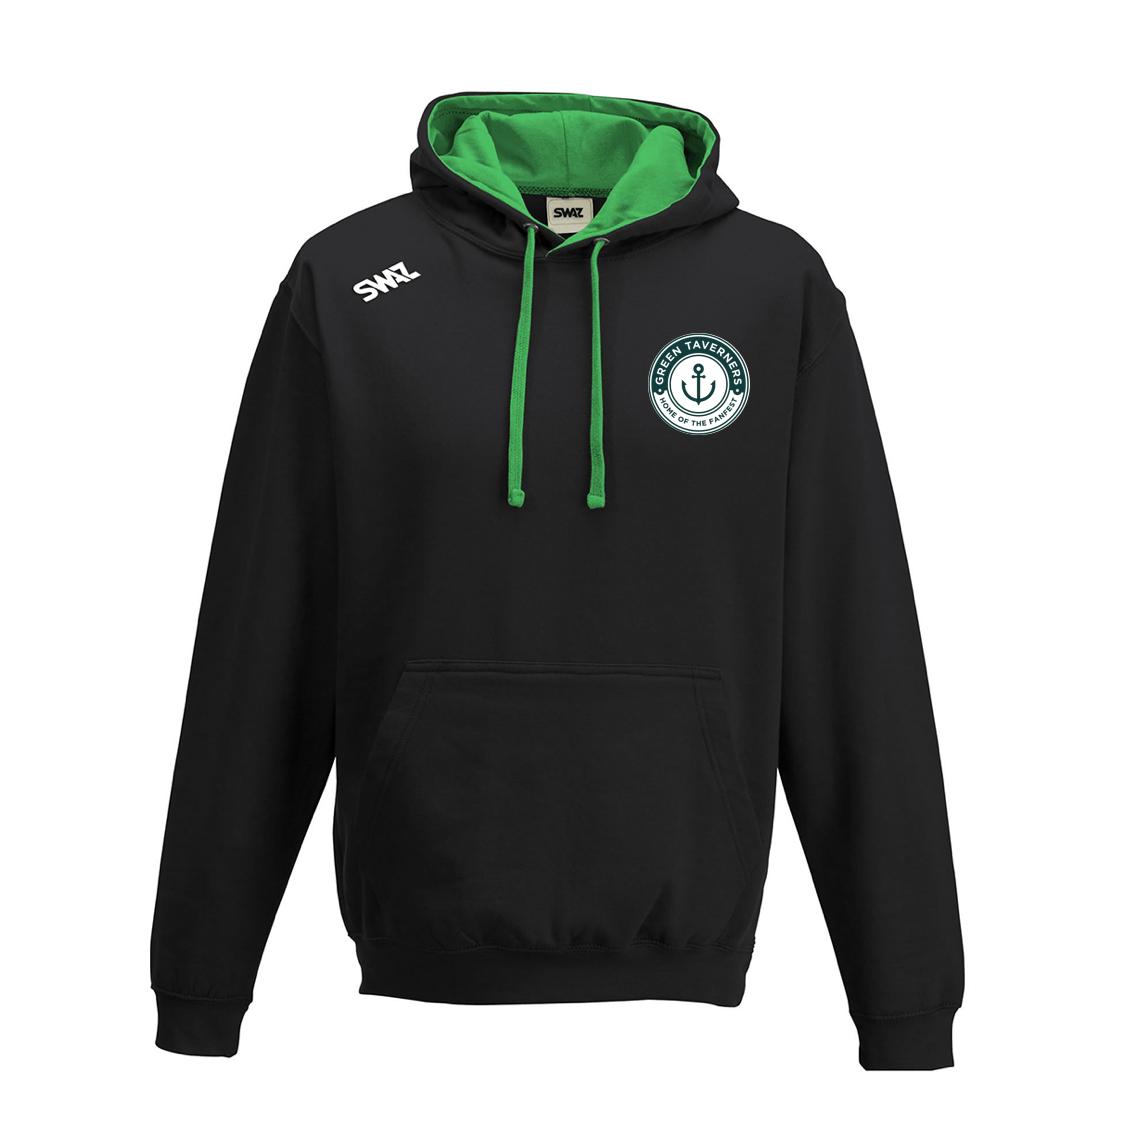 Green Taverners Hoody | SWAZ Teamwear | Football Kit Supplier